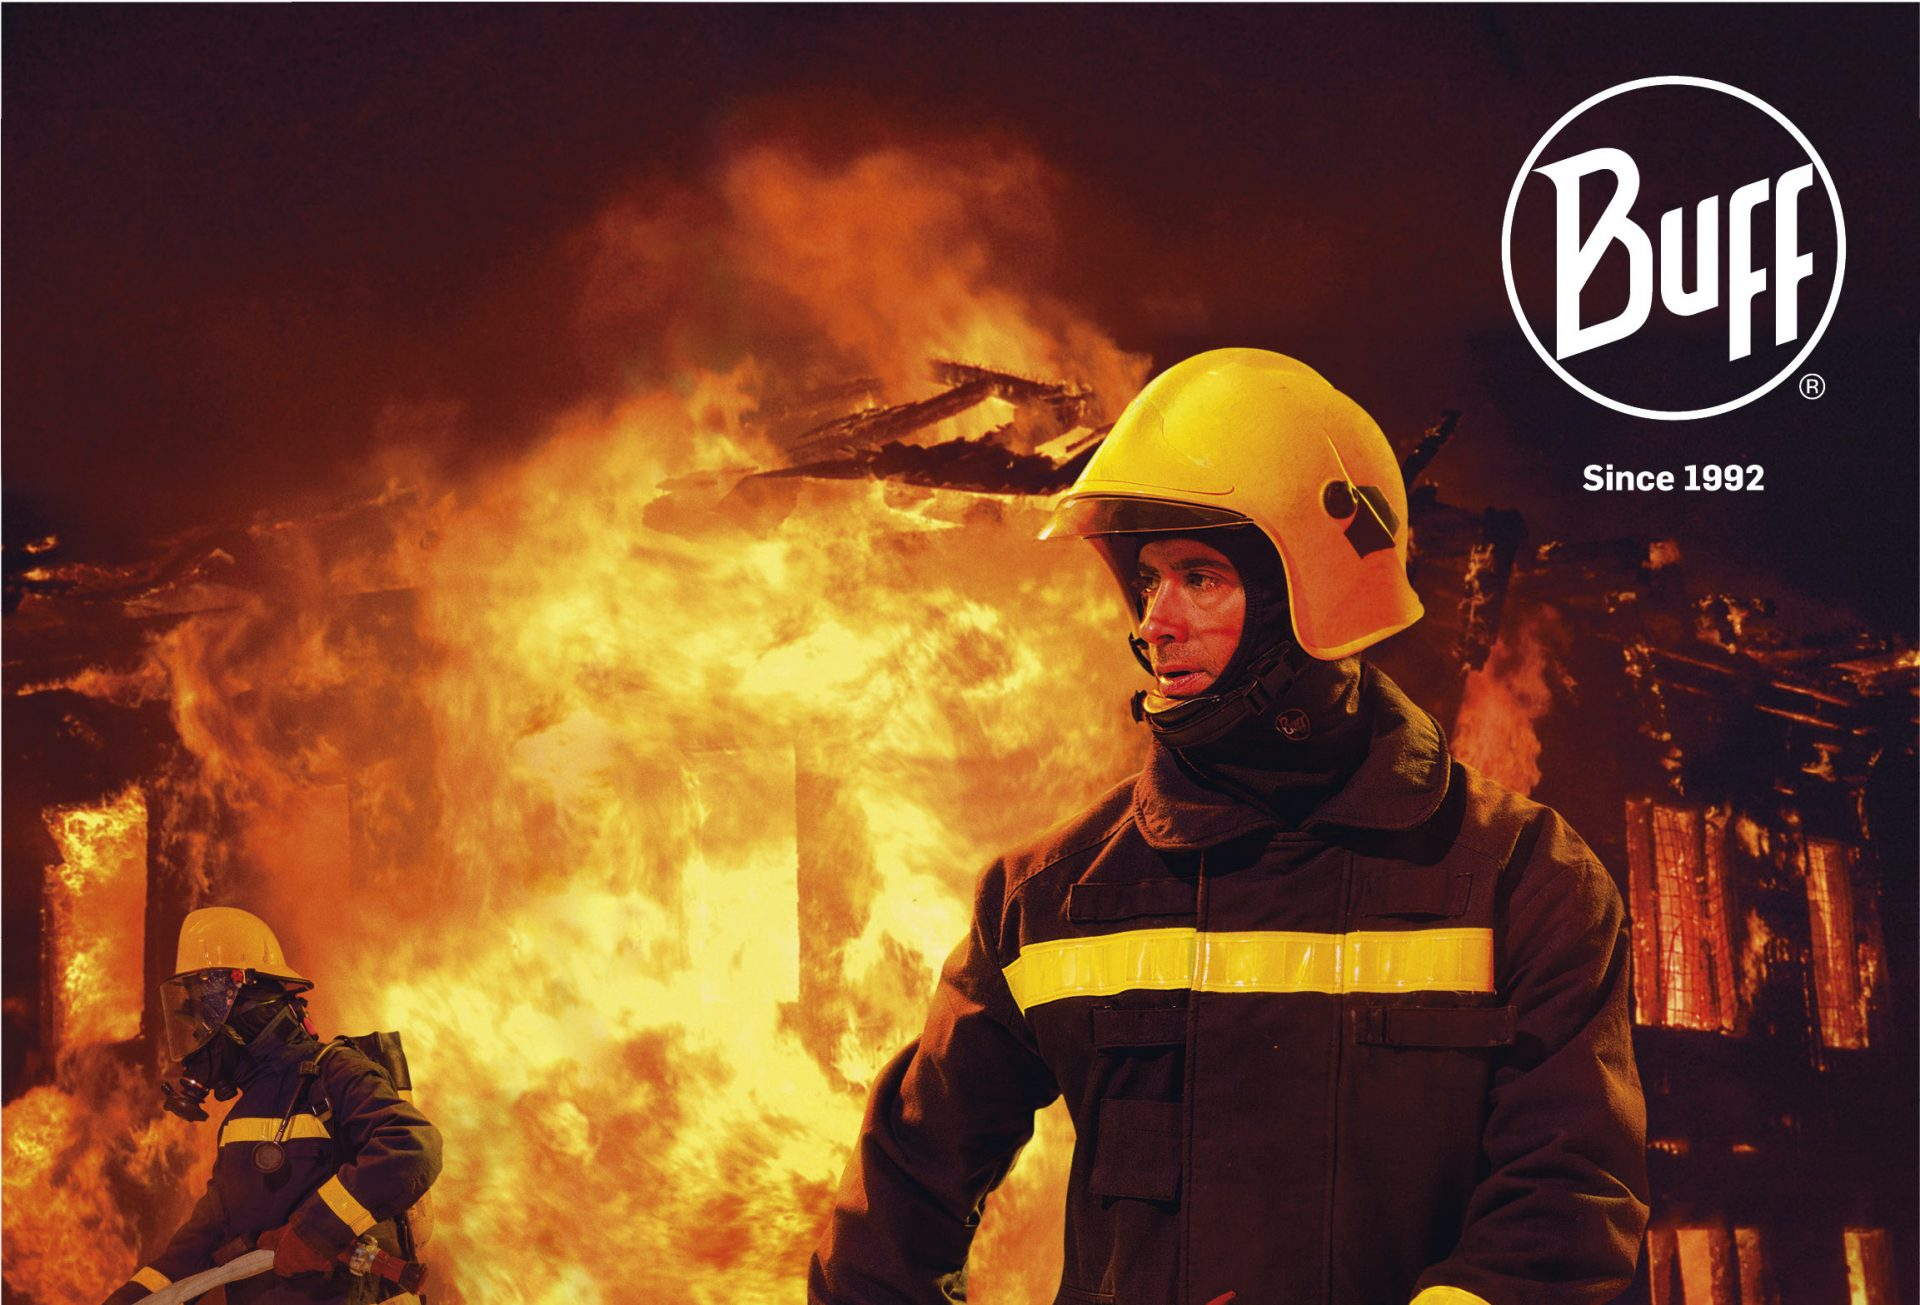 BUFF PRO - Advert A4 - Fuego 1